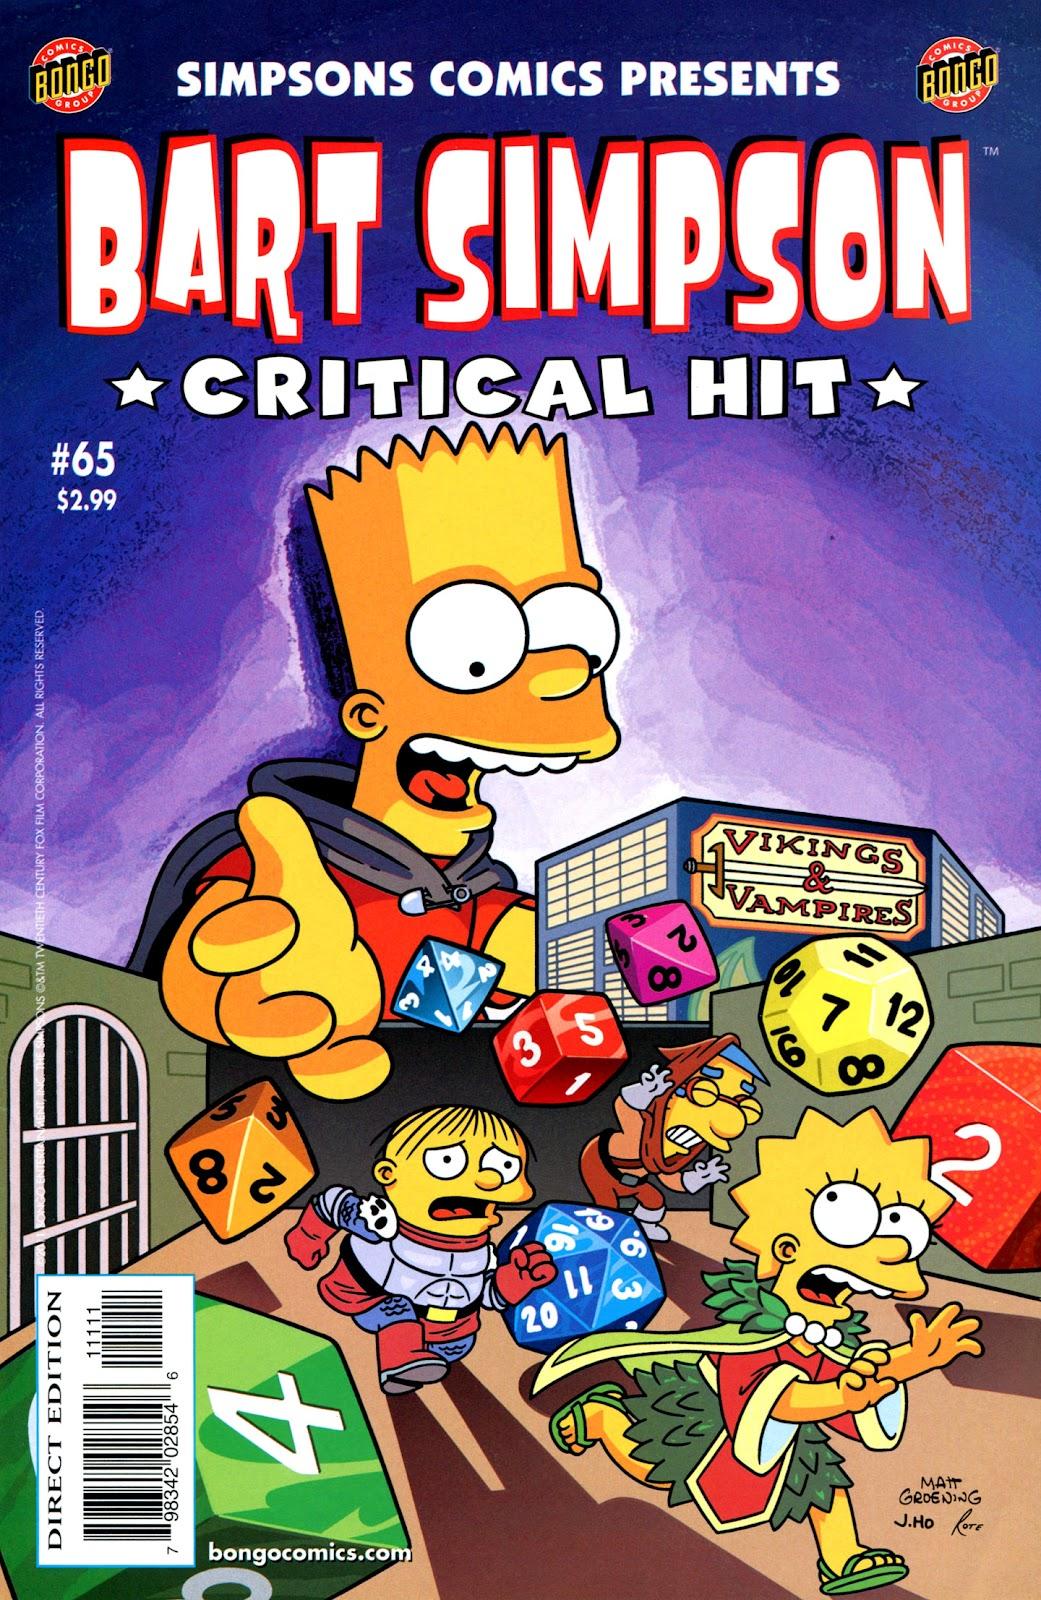 Simpsons Comics Presents Bart Simpson 65 Page 1